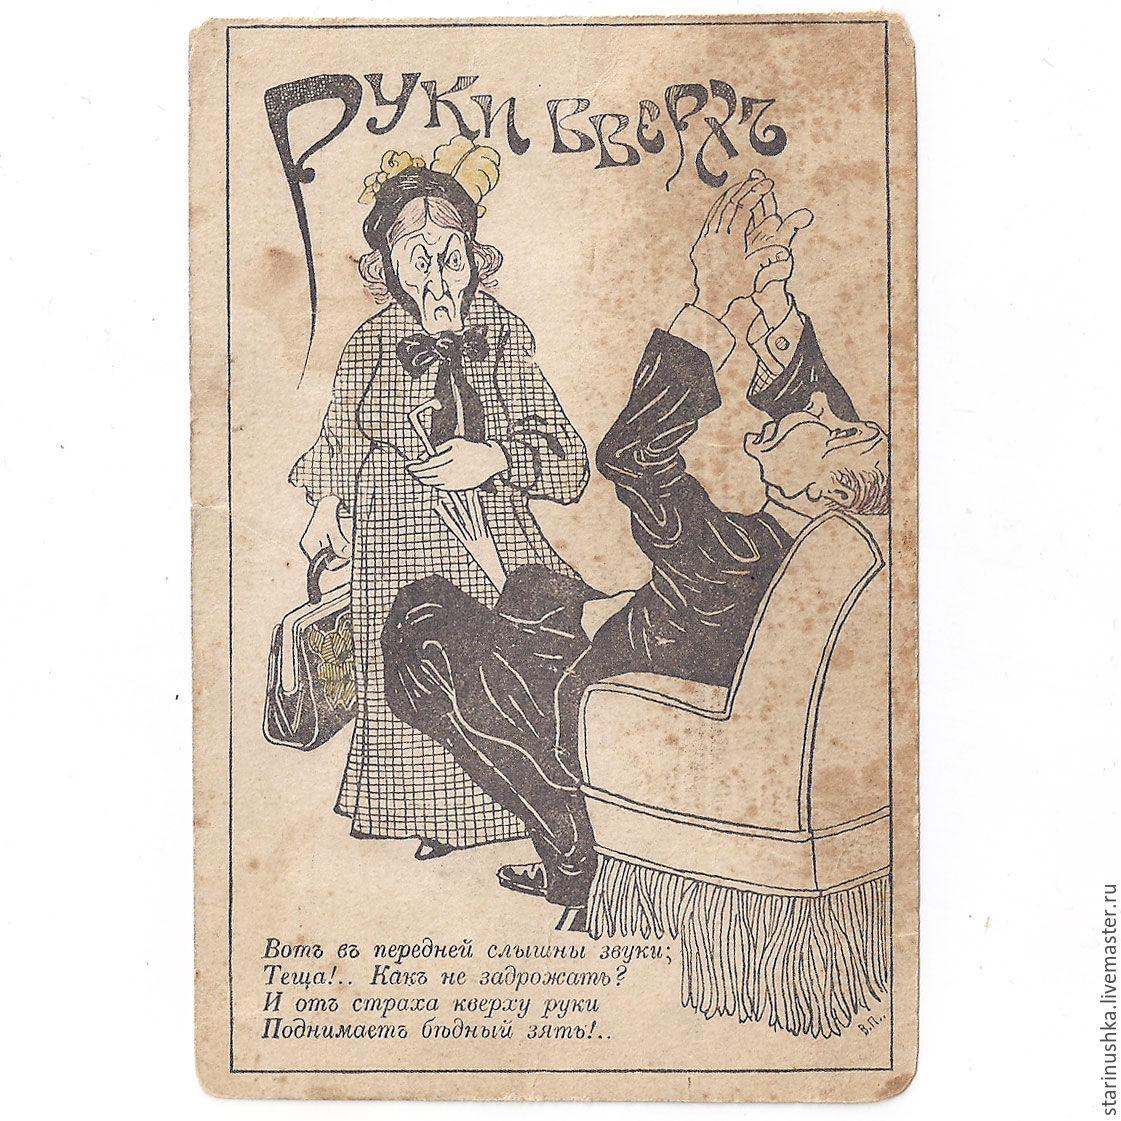 Антиквариат продажа открытки